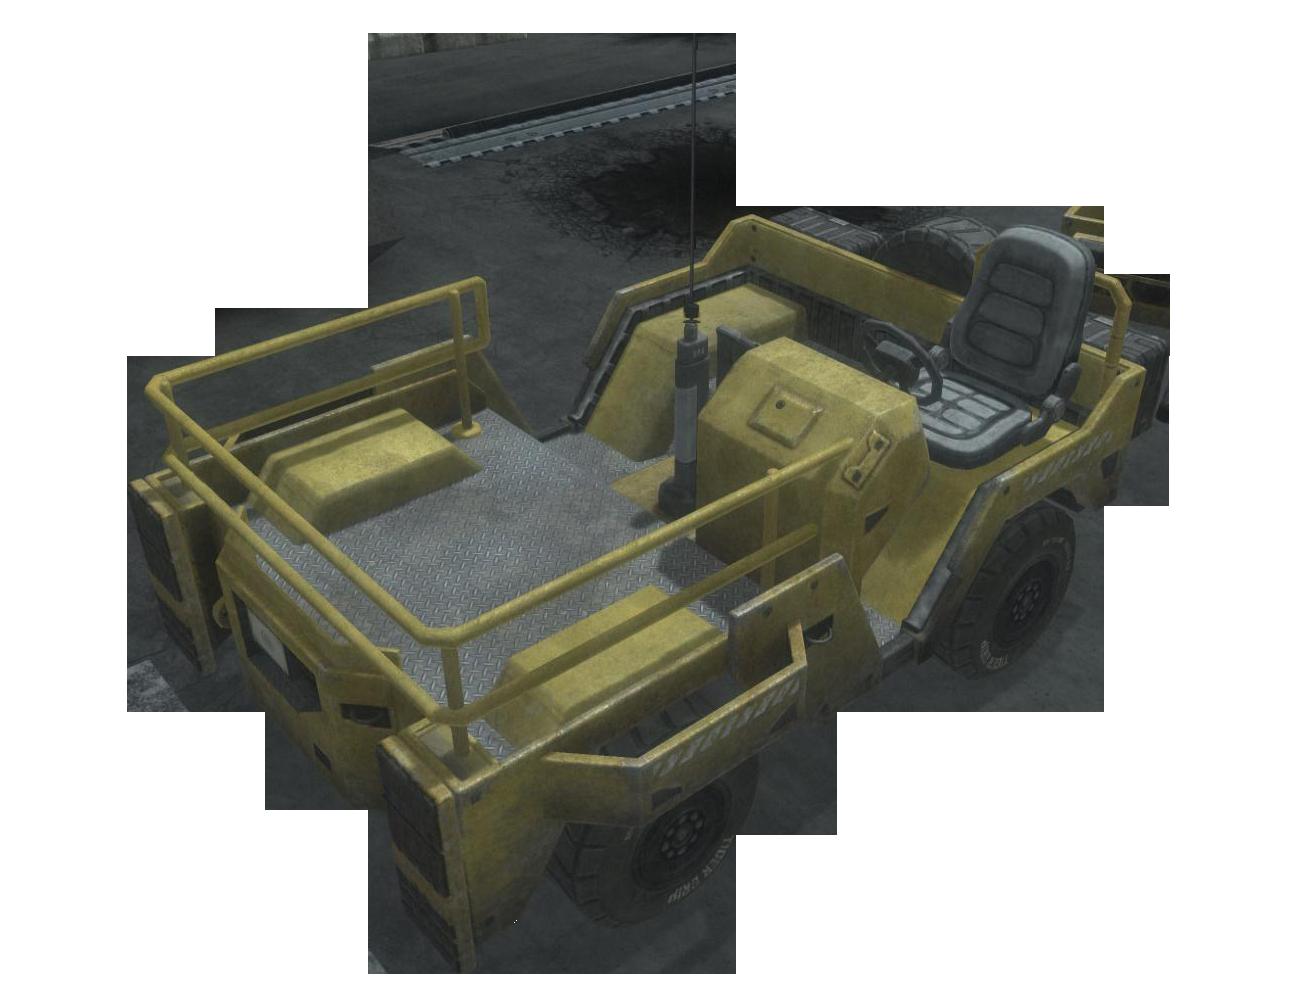 Tractor de Mercancías   Halopedia   FANDOM powered by Wikia